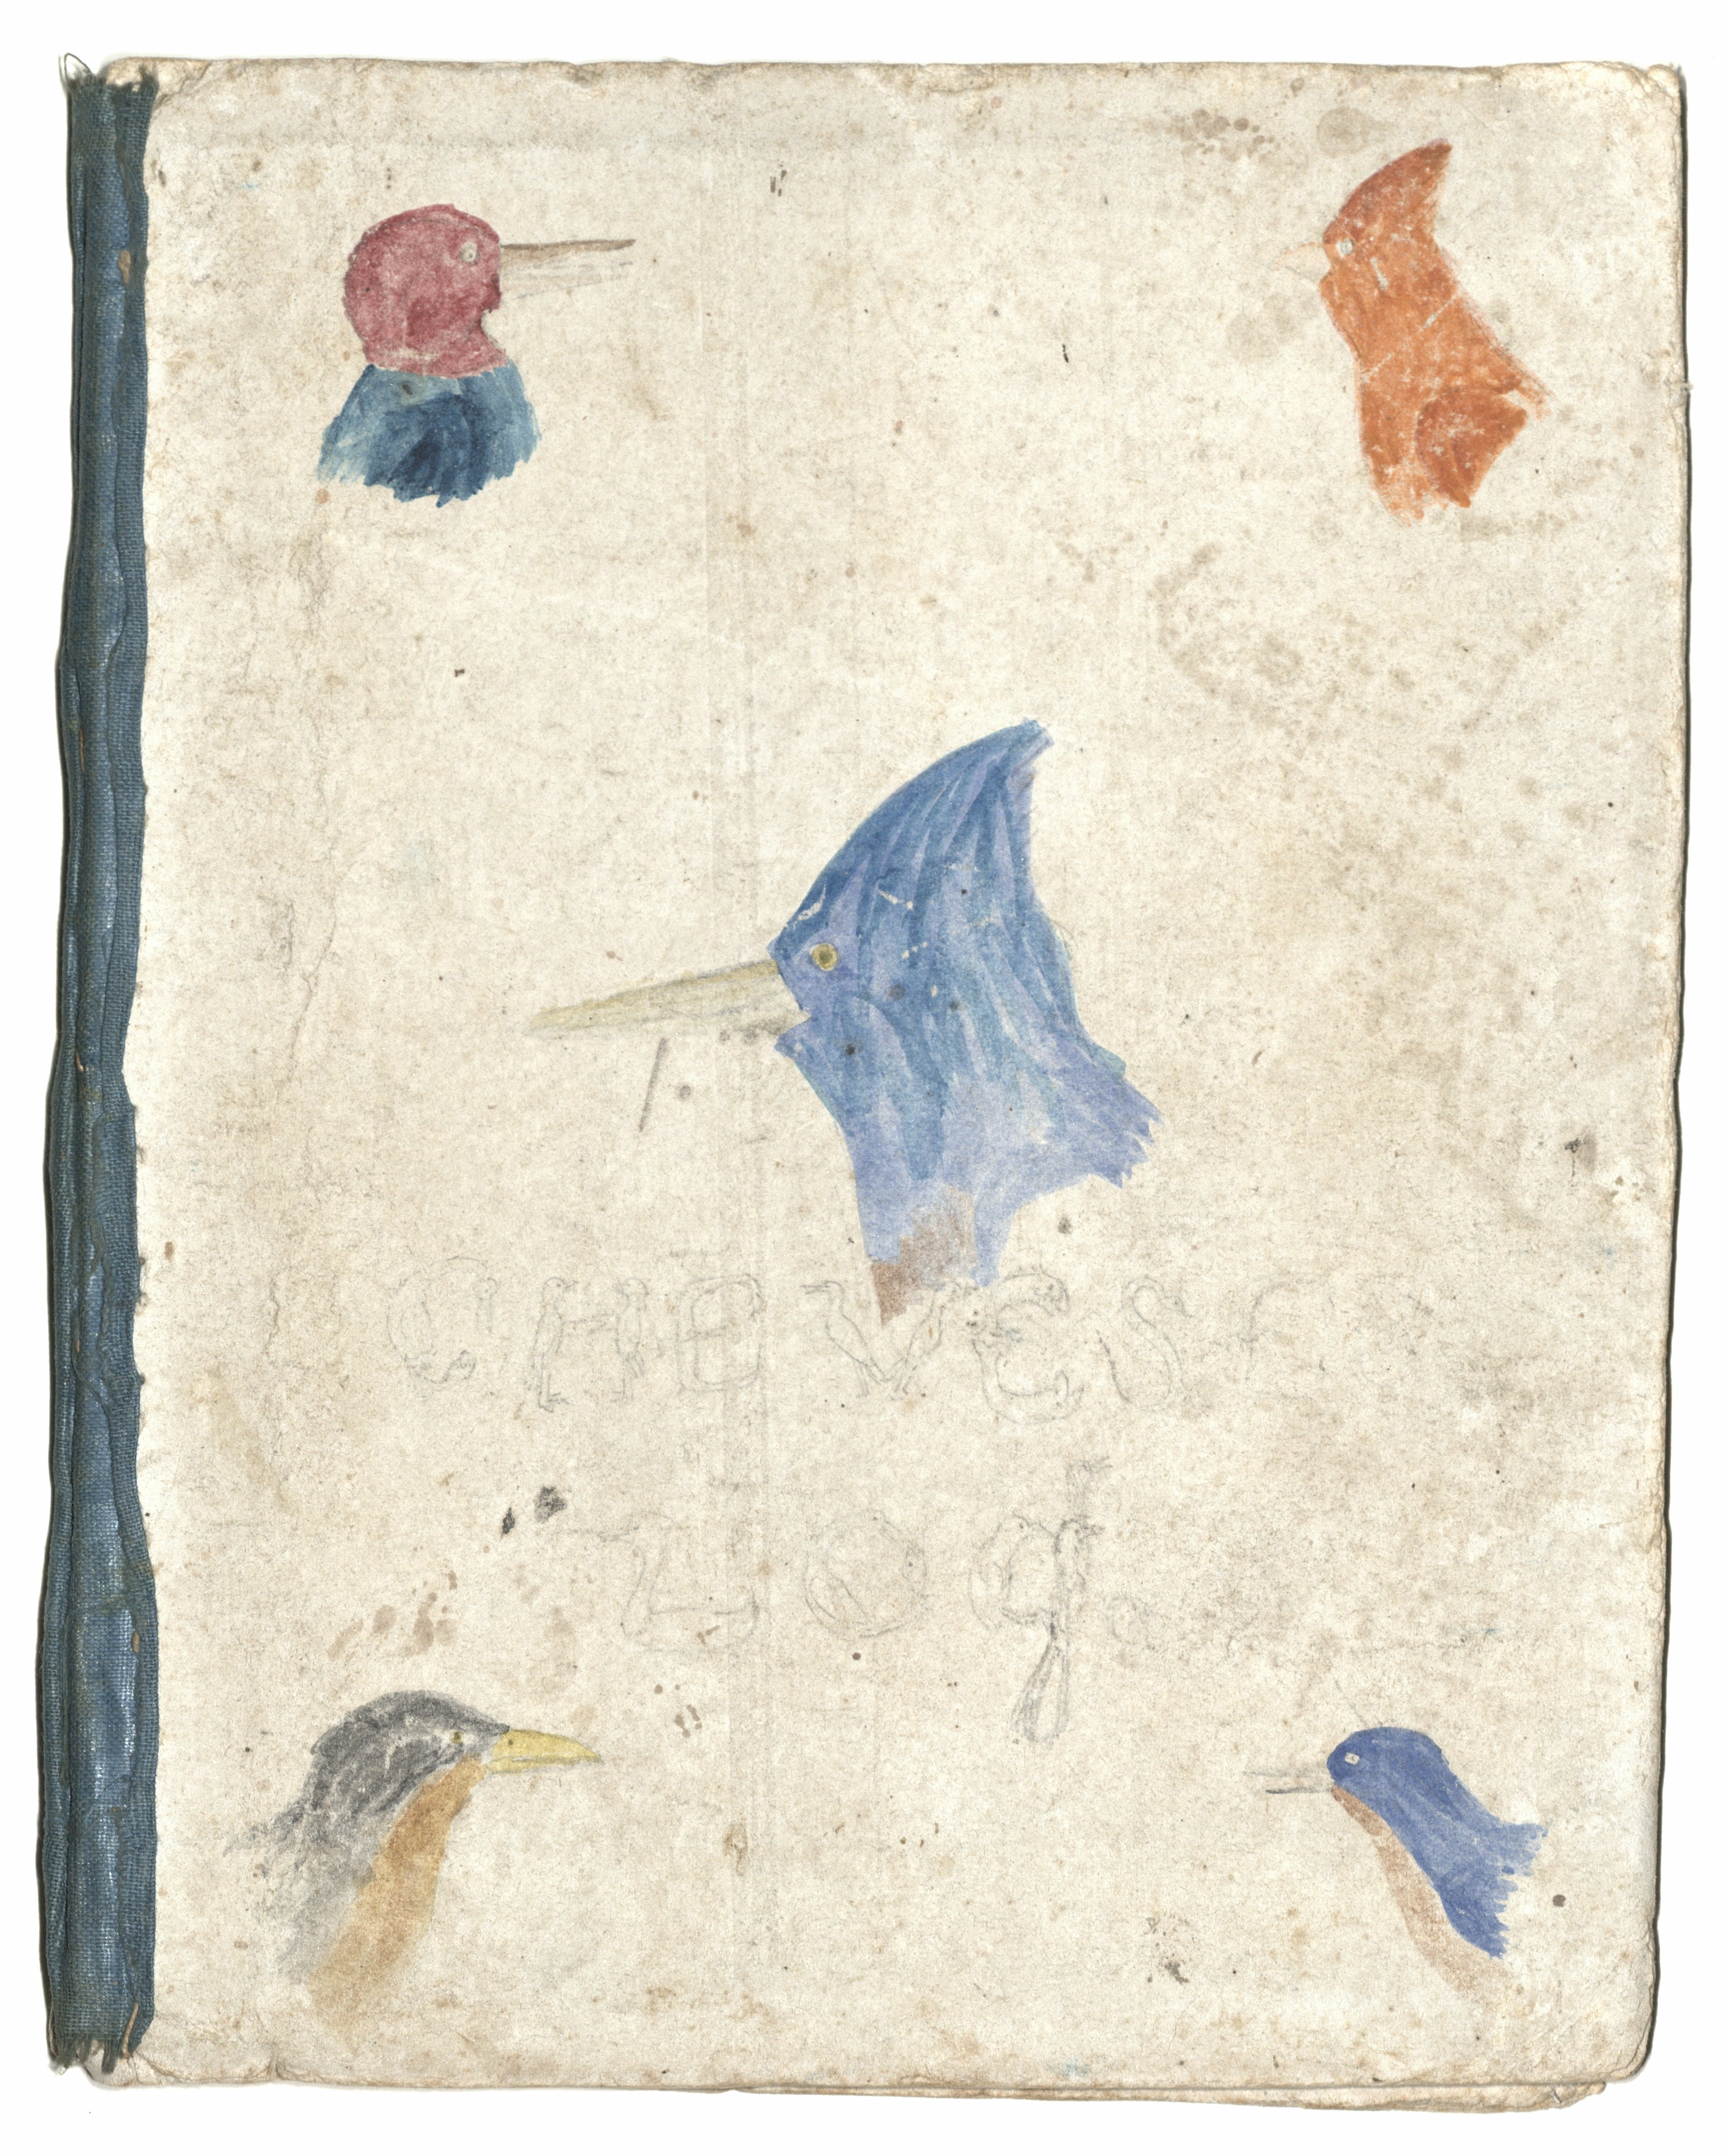 Langdon Cheves III Hunting Notes & Art